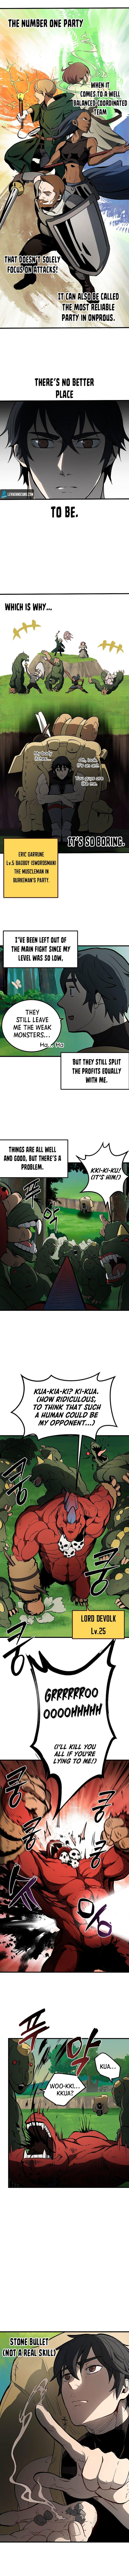 Survival Story Of A Sword King In A Fantasy World Chapter 6 page 7 - Mangakakalots.com